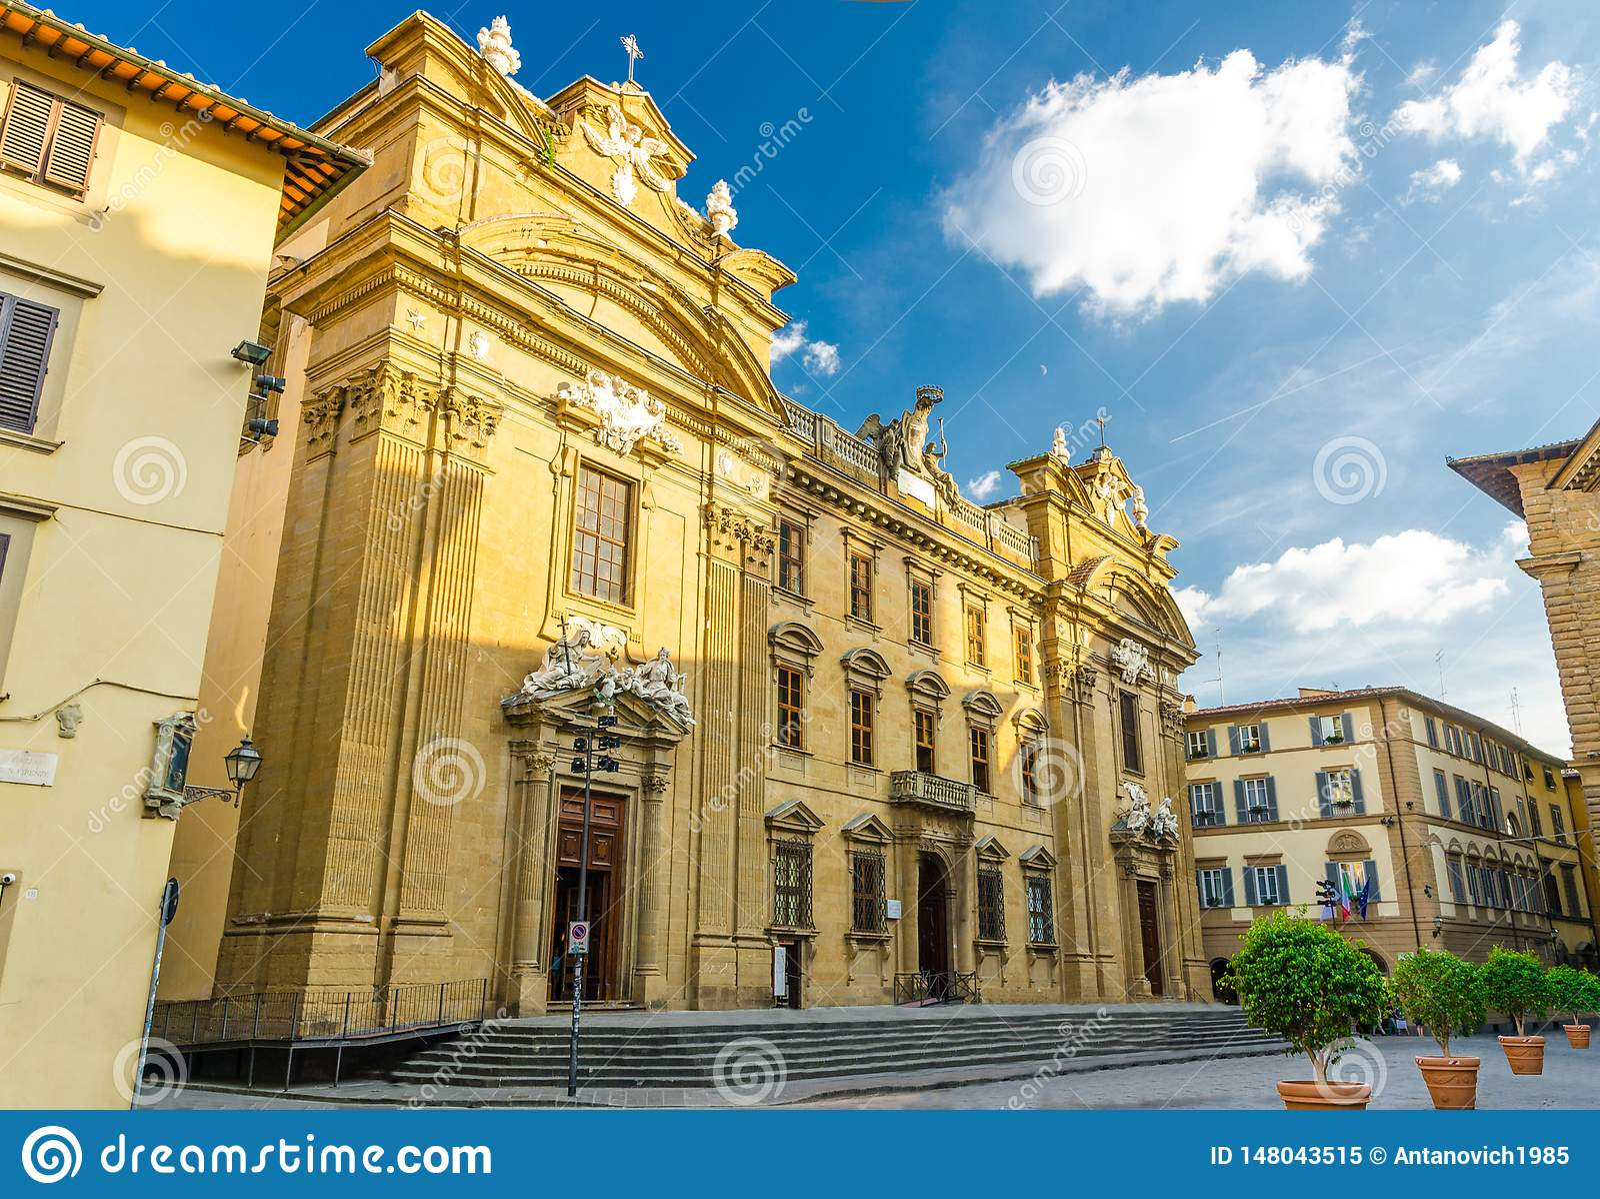 Iglesia católica de Complesso di San Firenze Chiesa San Filippo Neri en el cuadrado de Piazza di San Firenze en el centro históri